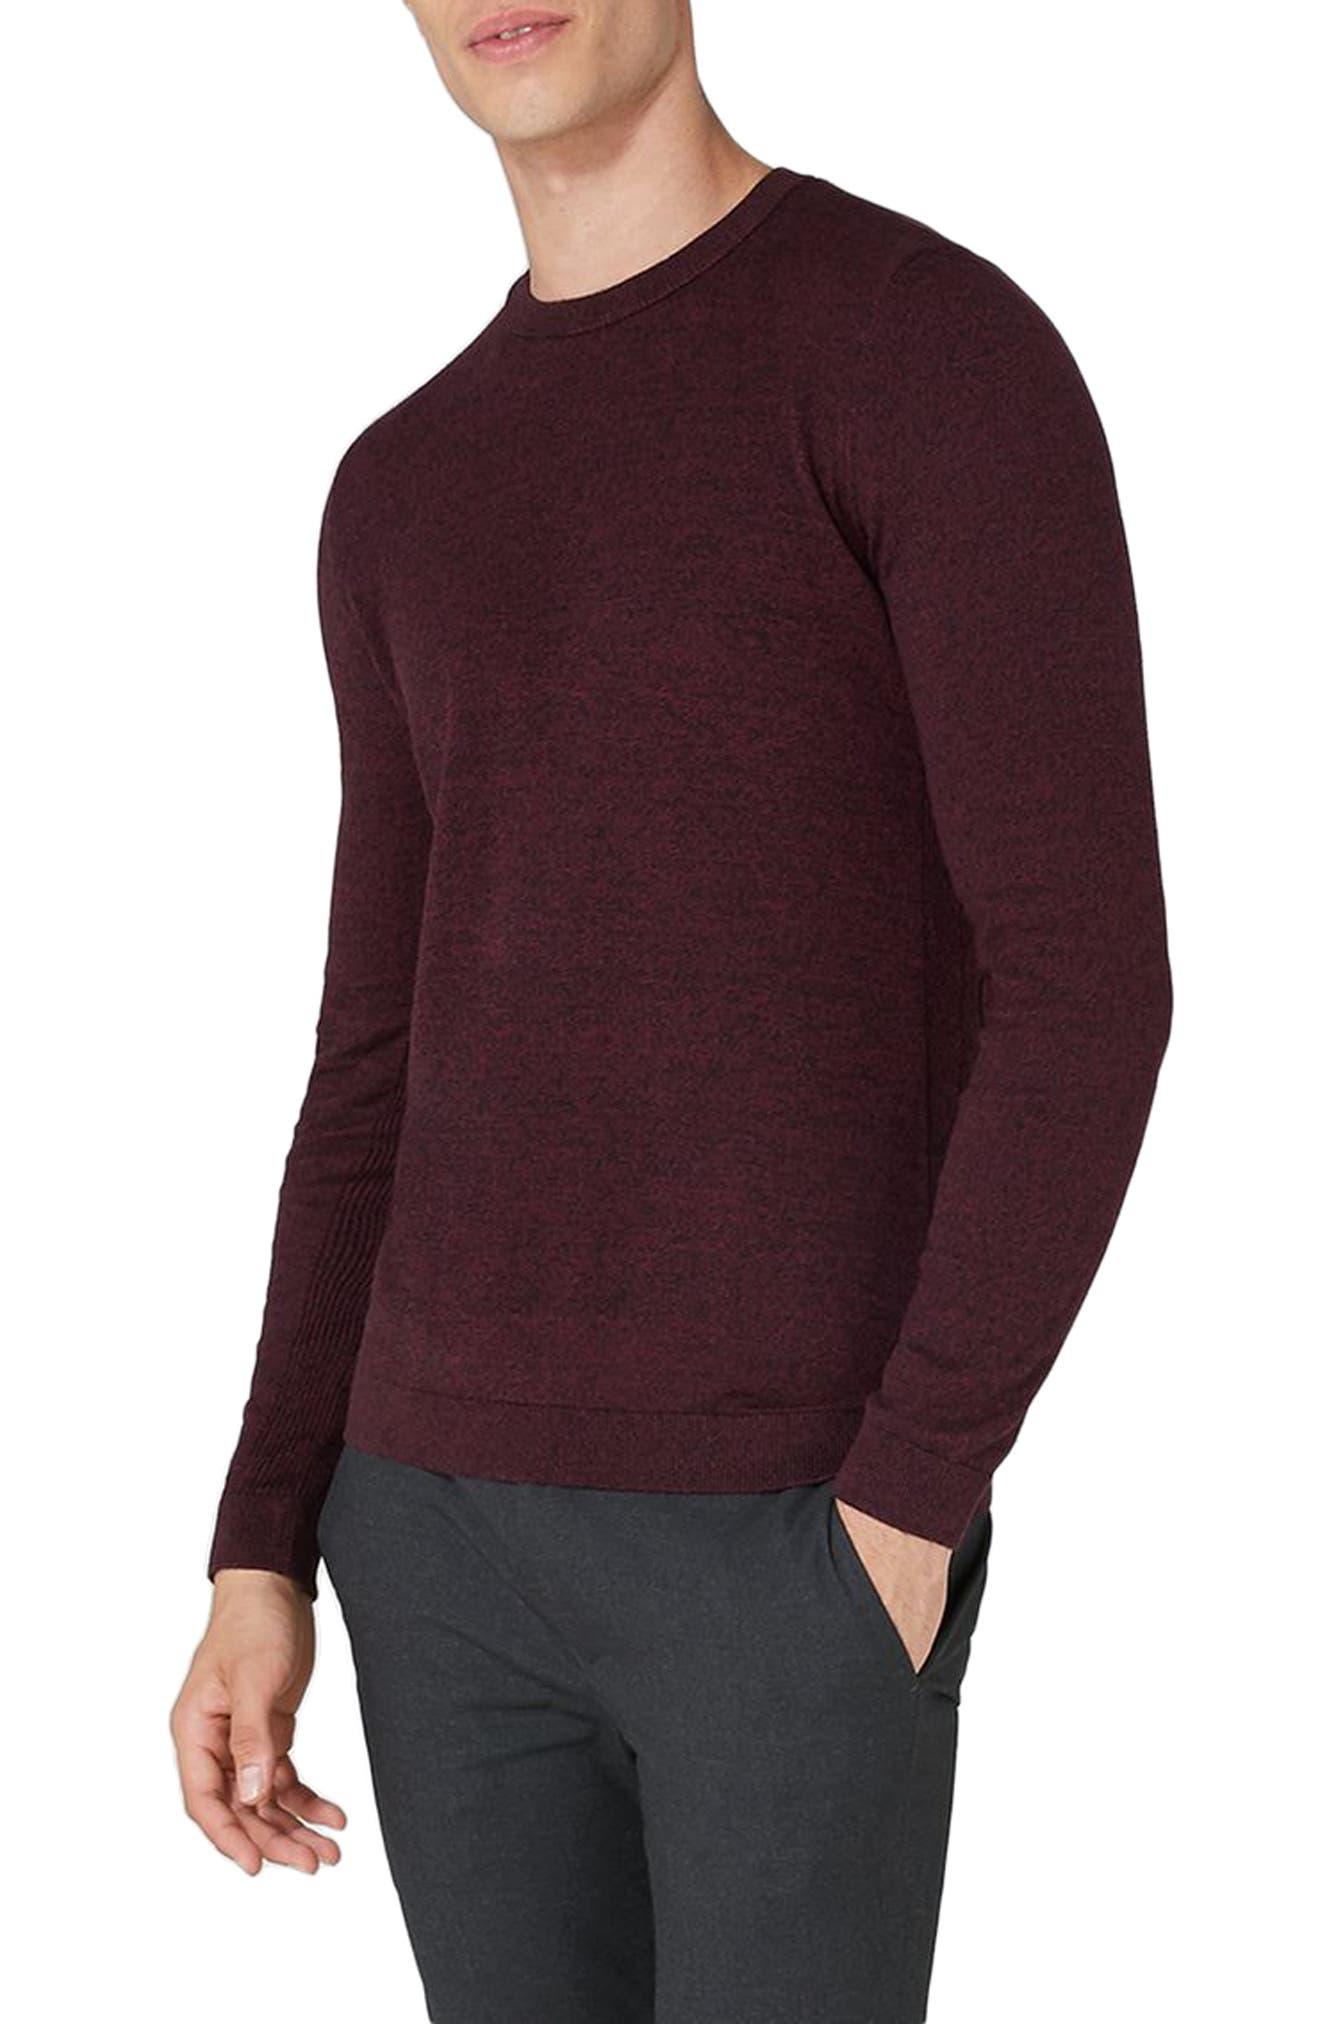 Alternate Image 1 Selected - Topman Side Ribbed Slim Fit Sweater